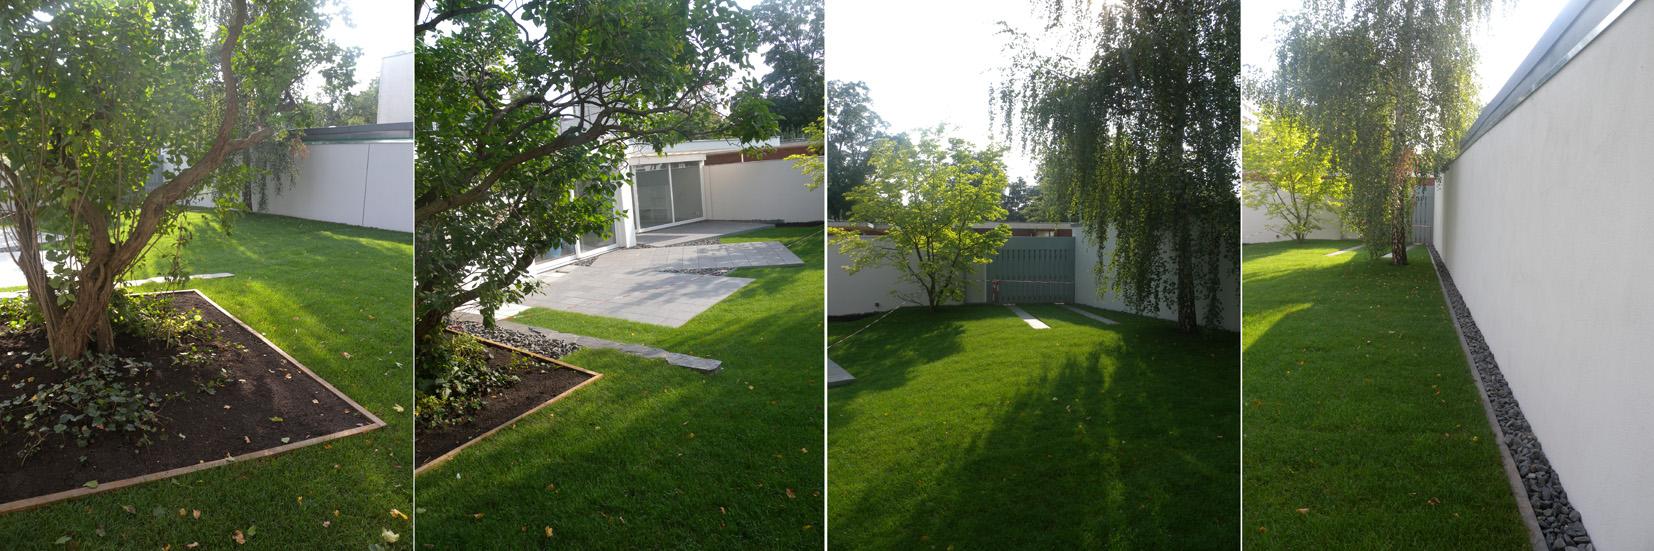 Garten Kirsten kl